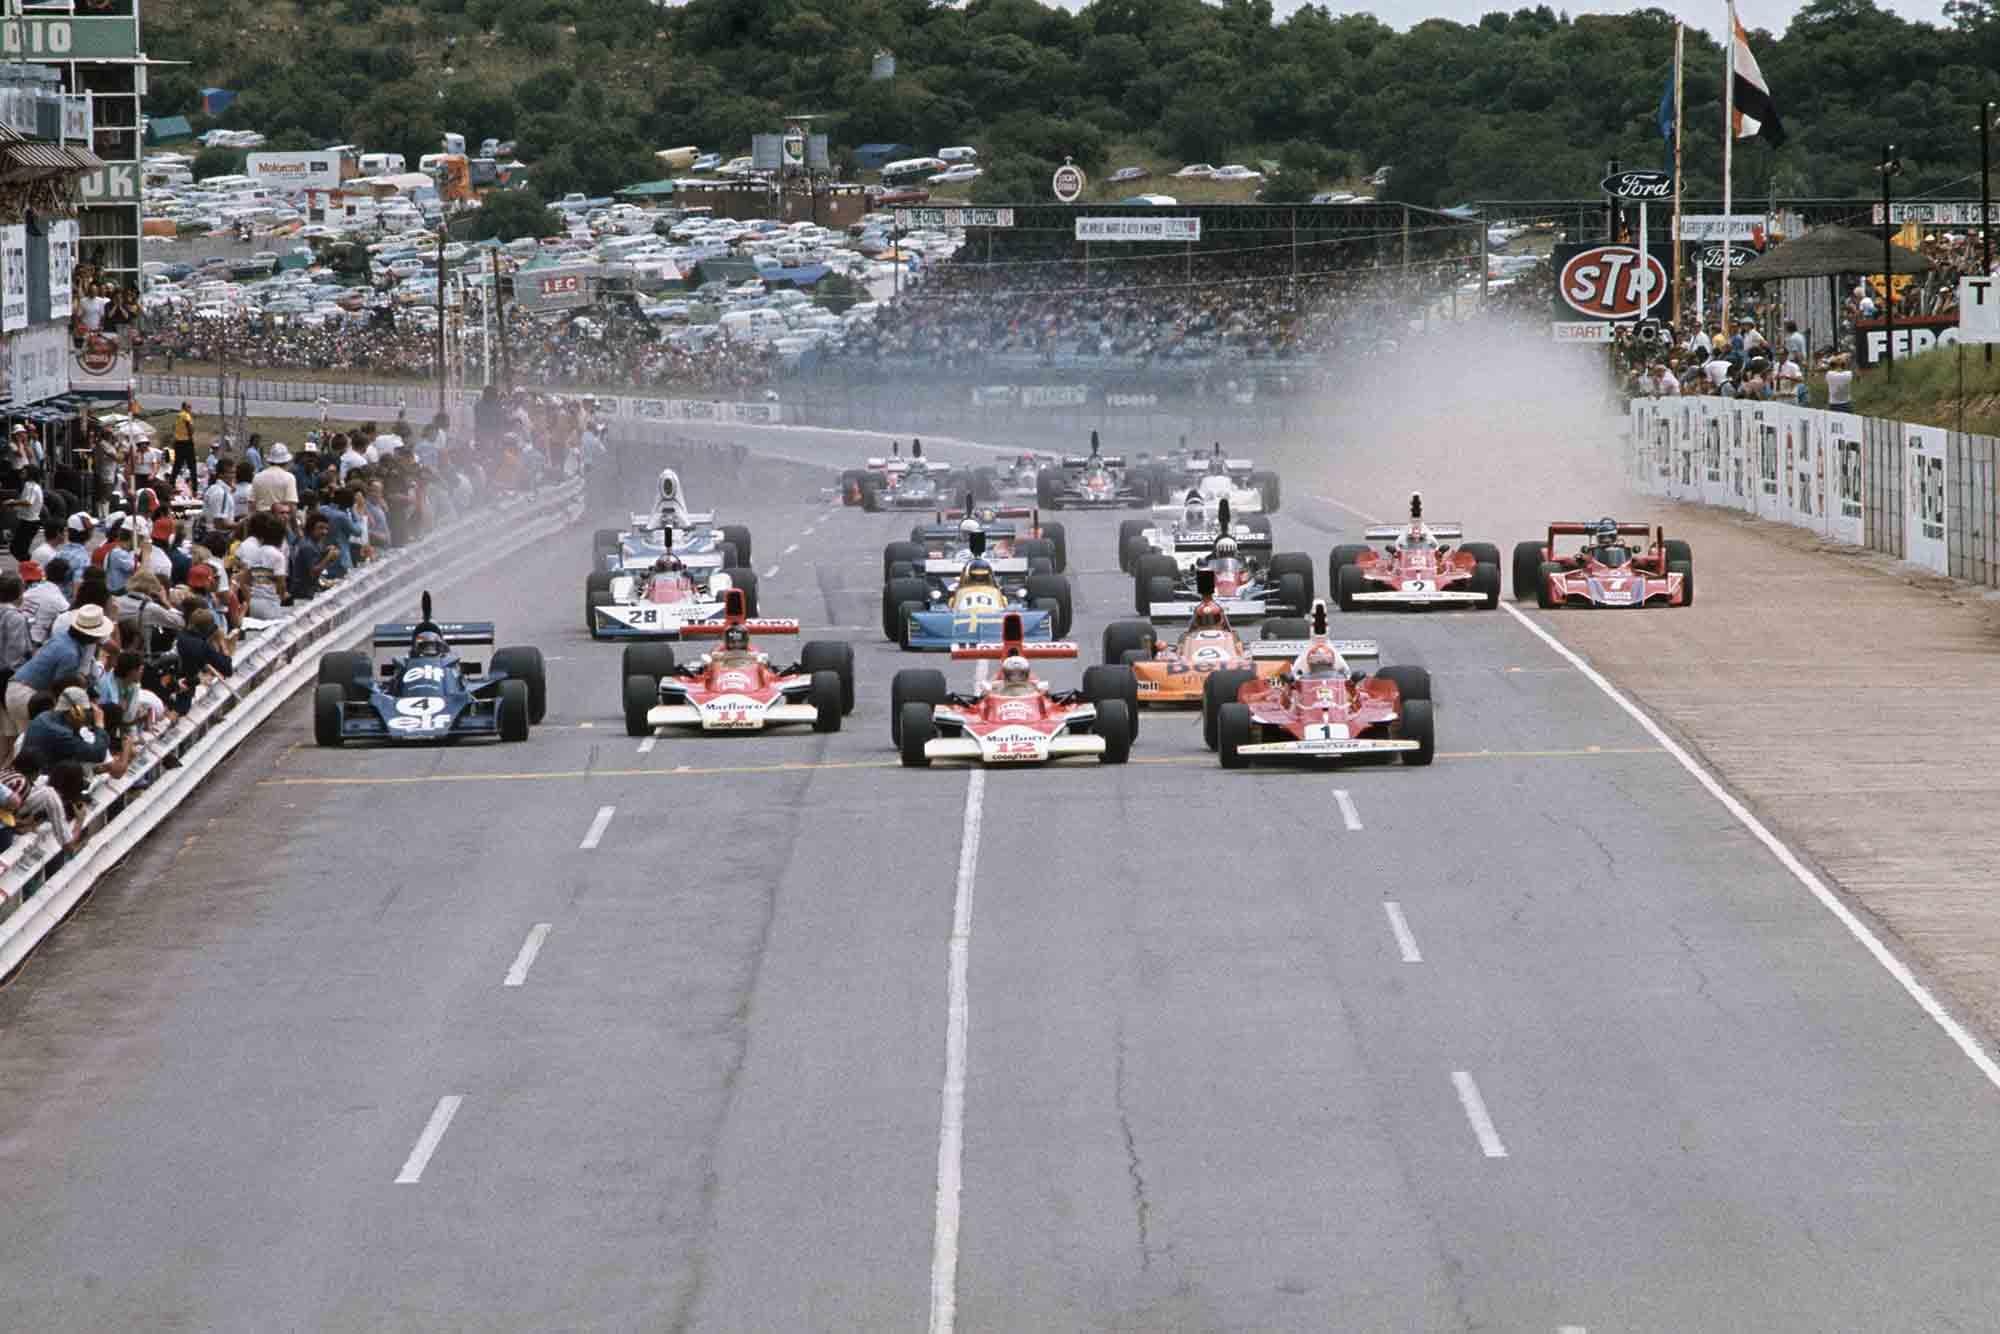 Niki Lauda's Ferrari leads the field at 1976 South African Grand Prix